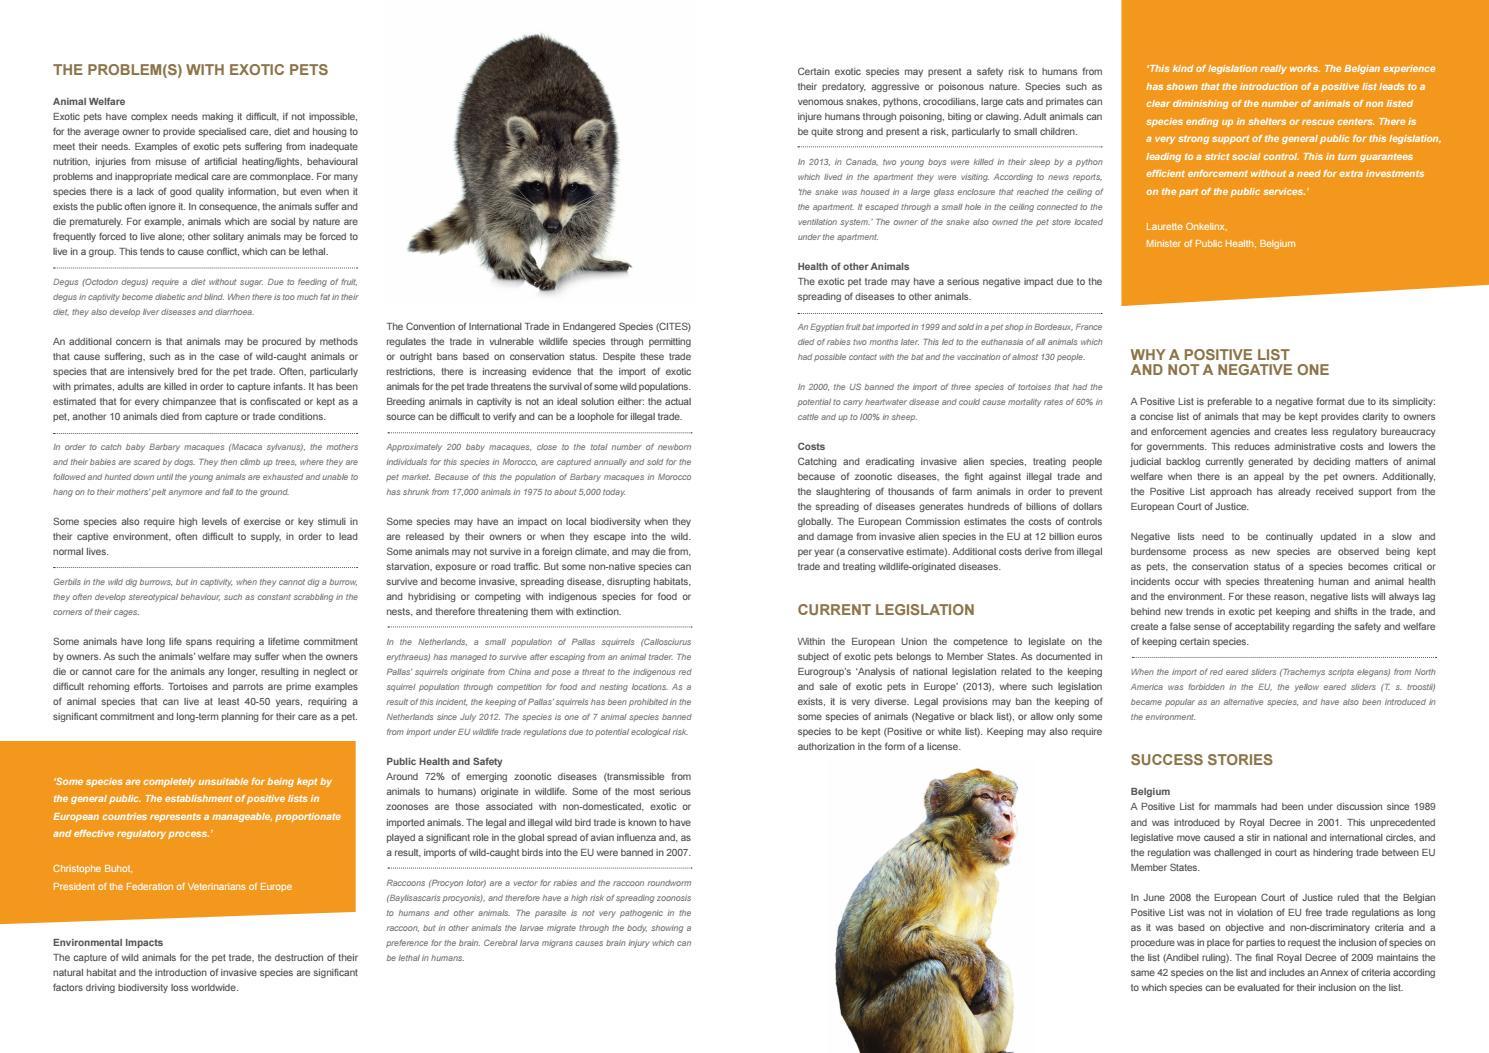 Eurogroup for Animals - #Act4Wildlife - Positive list